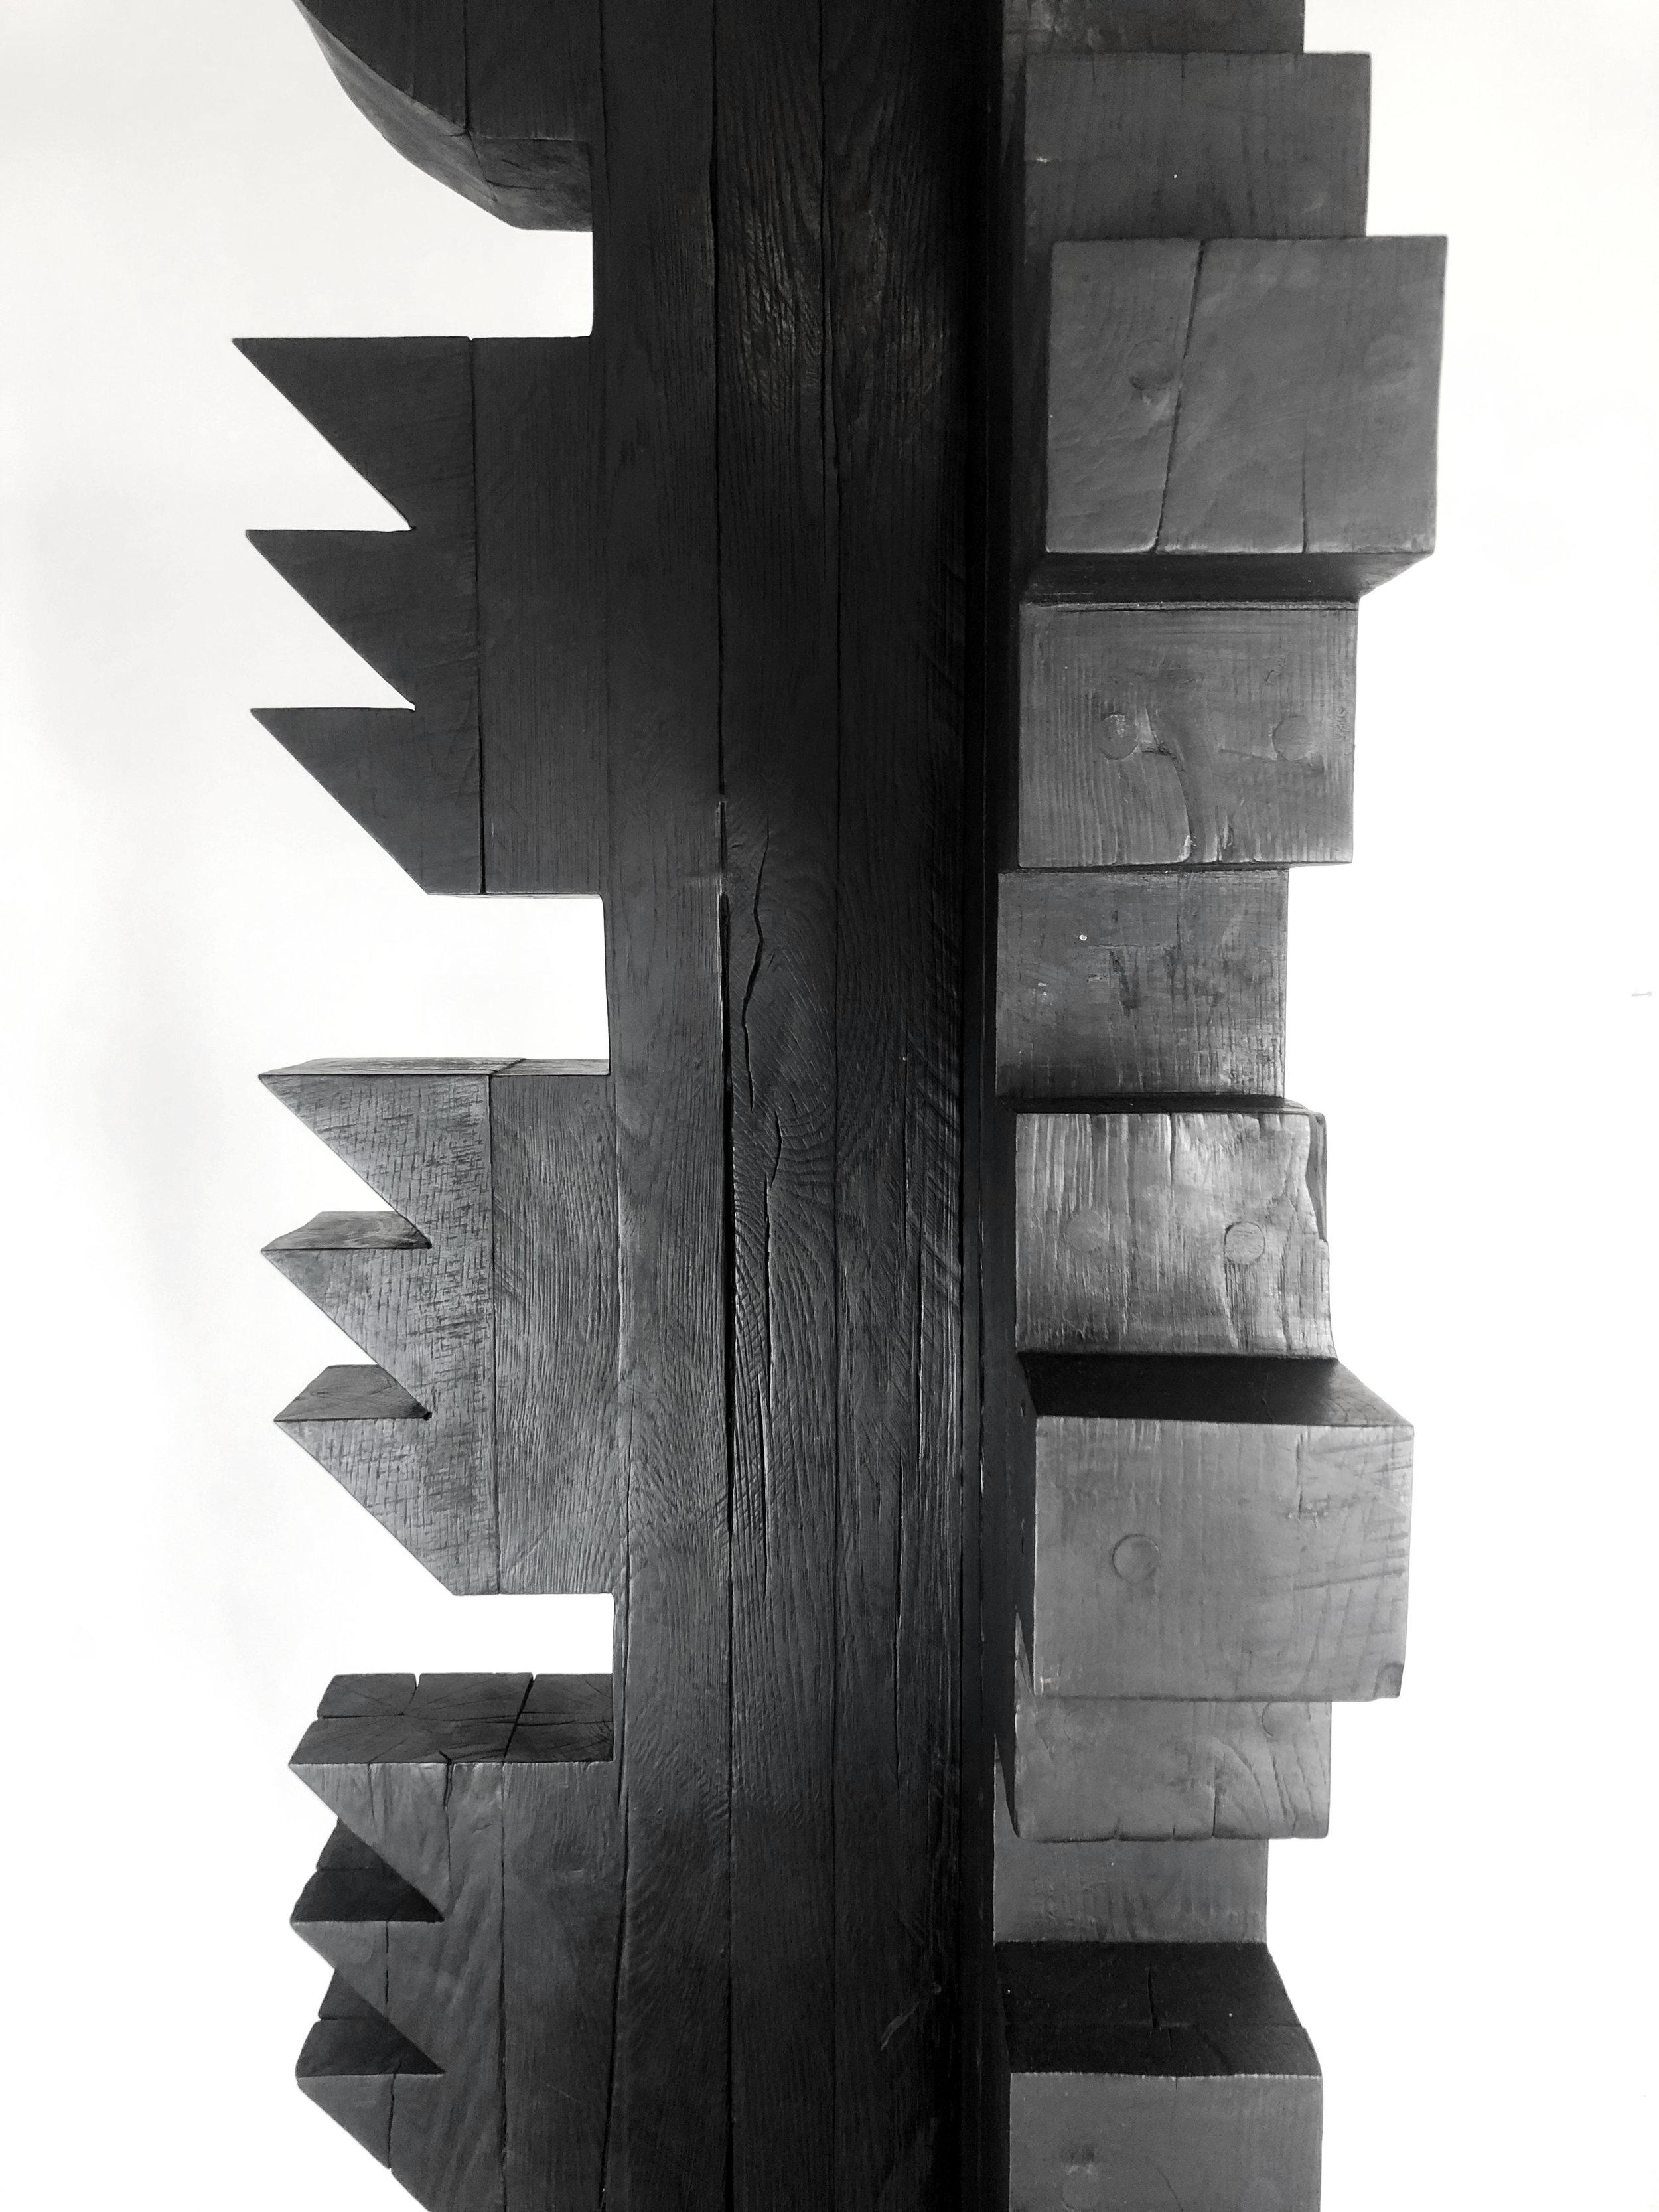 'Torr II', Burnt oak finished with wax, 195x40x40cm